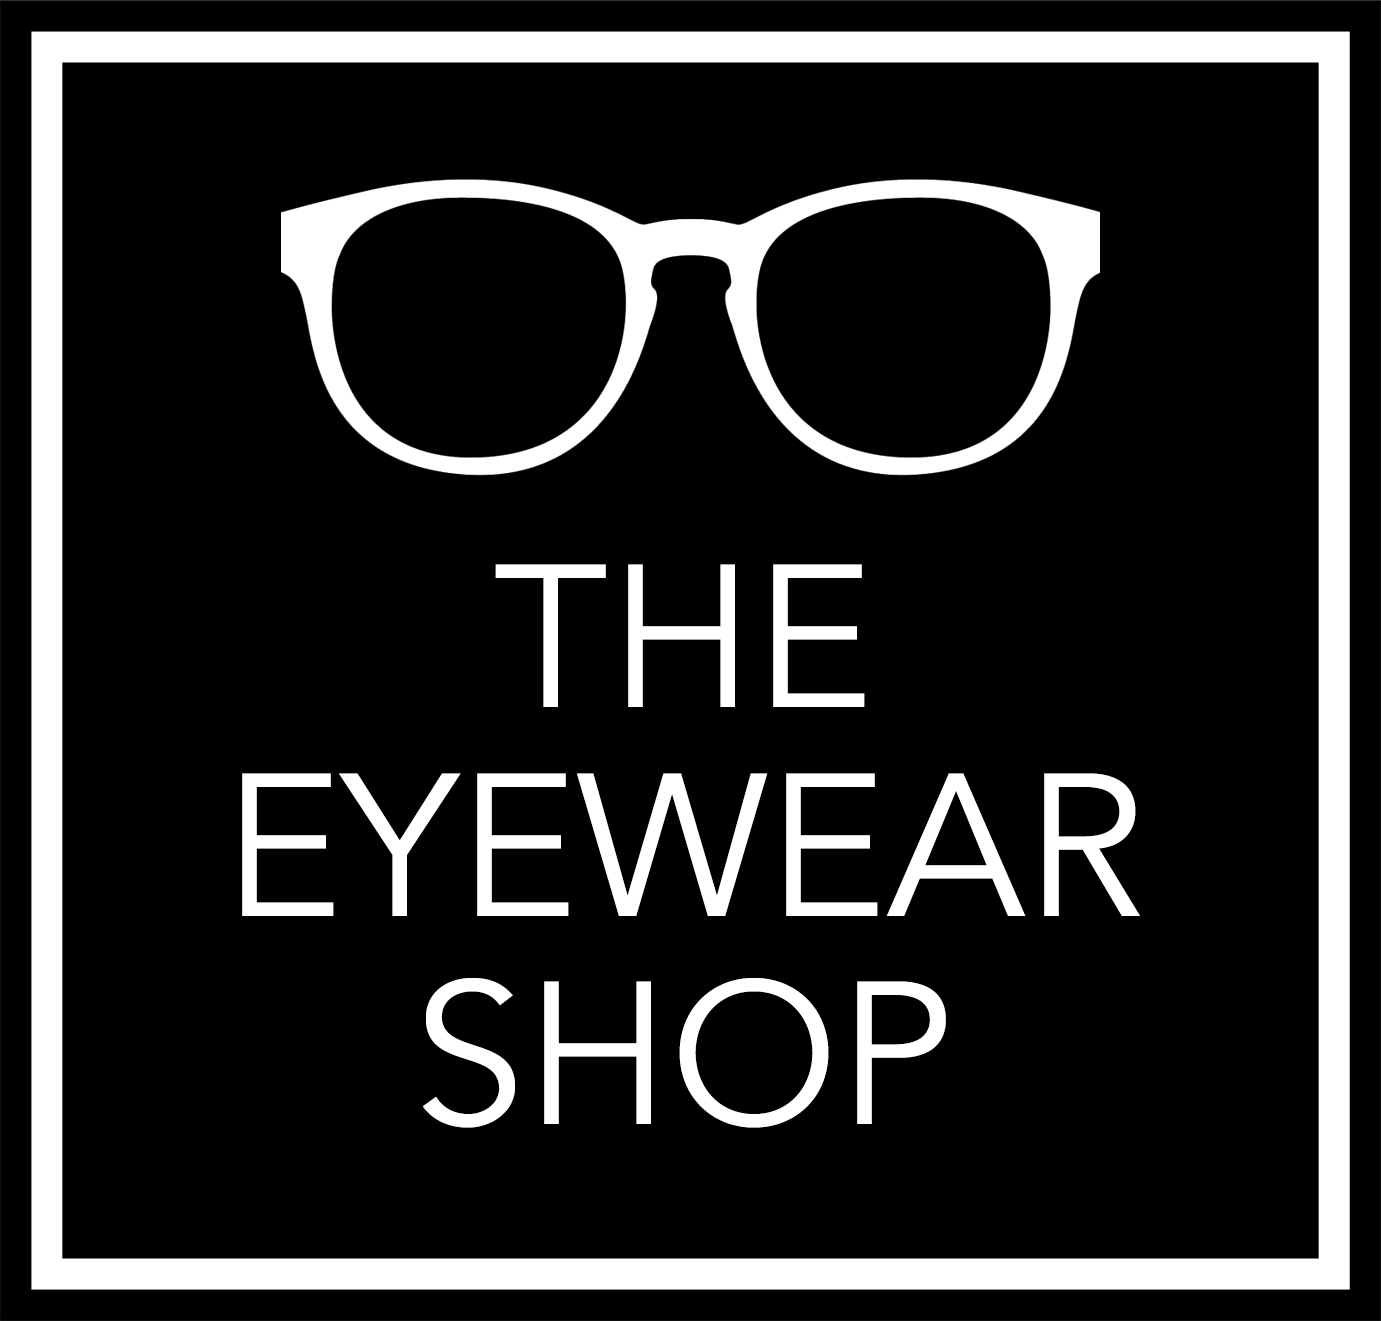 The Eyewear Shop